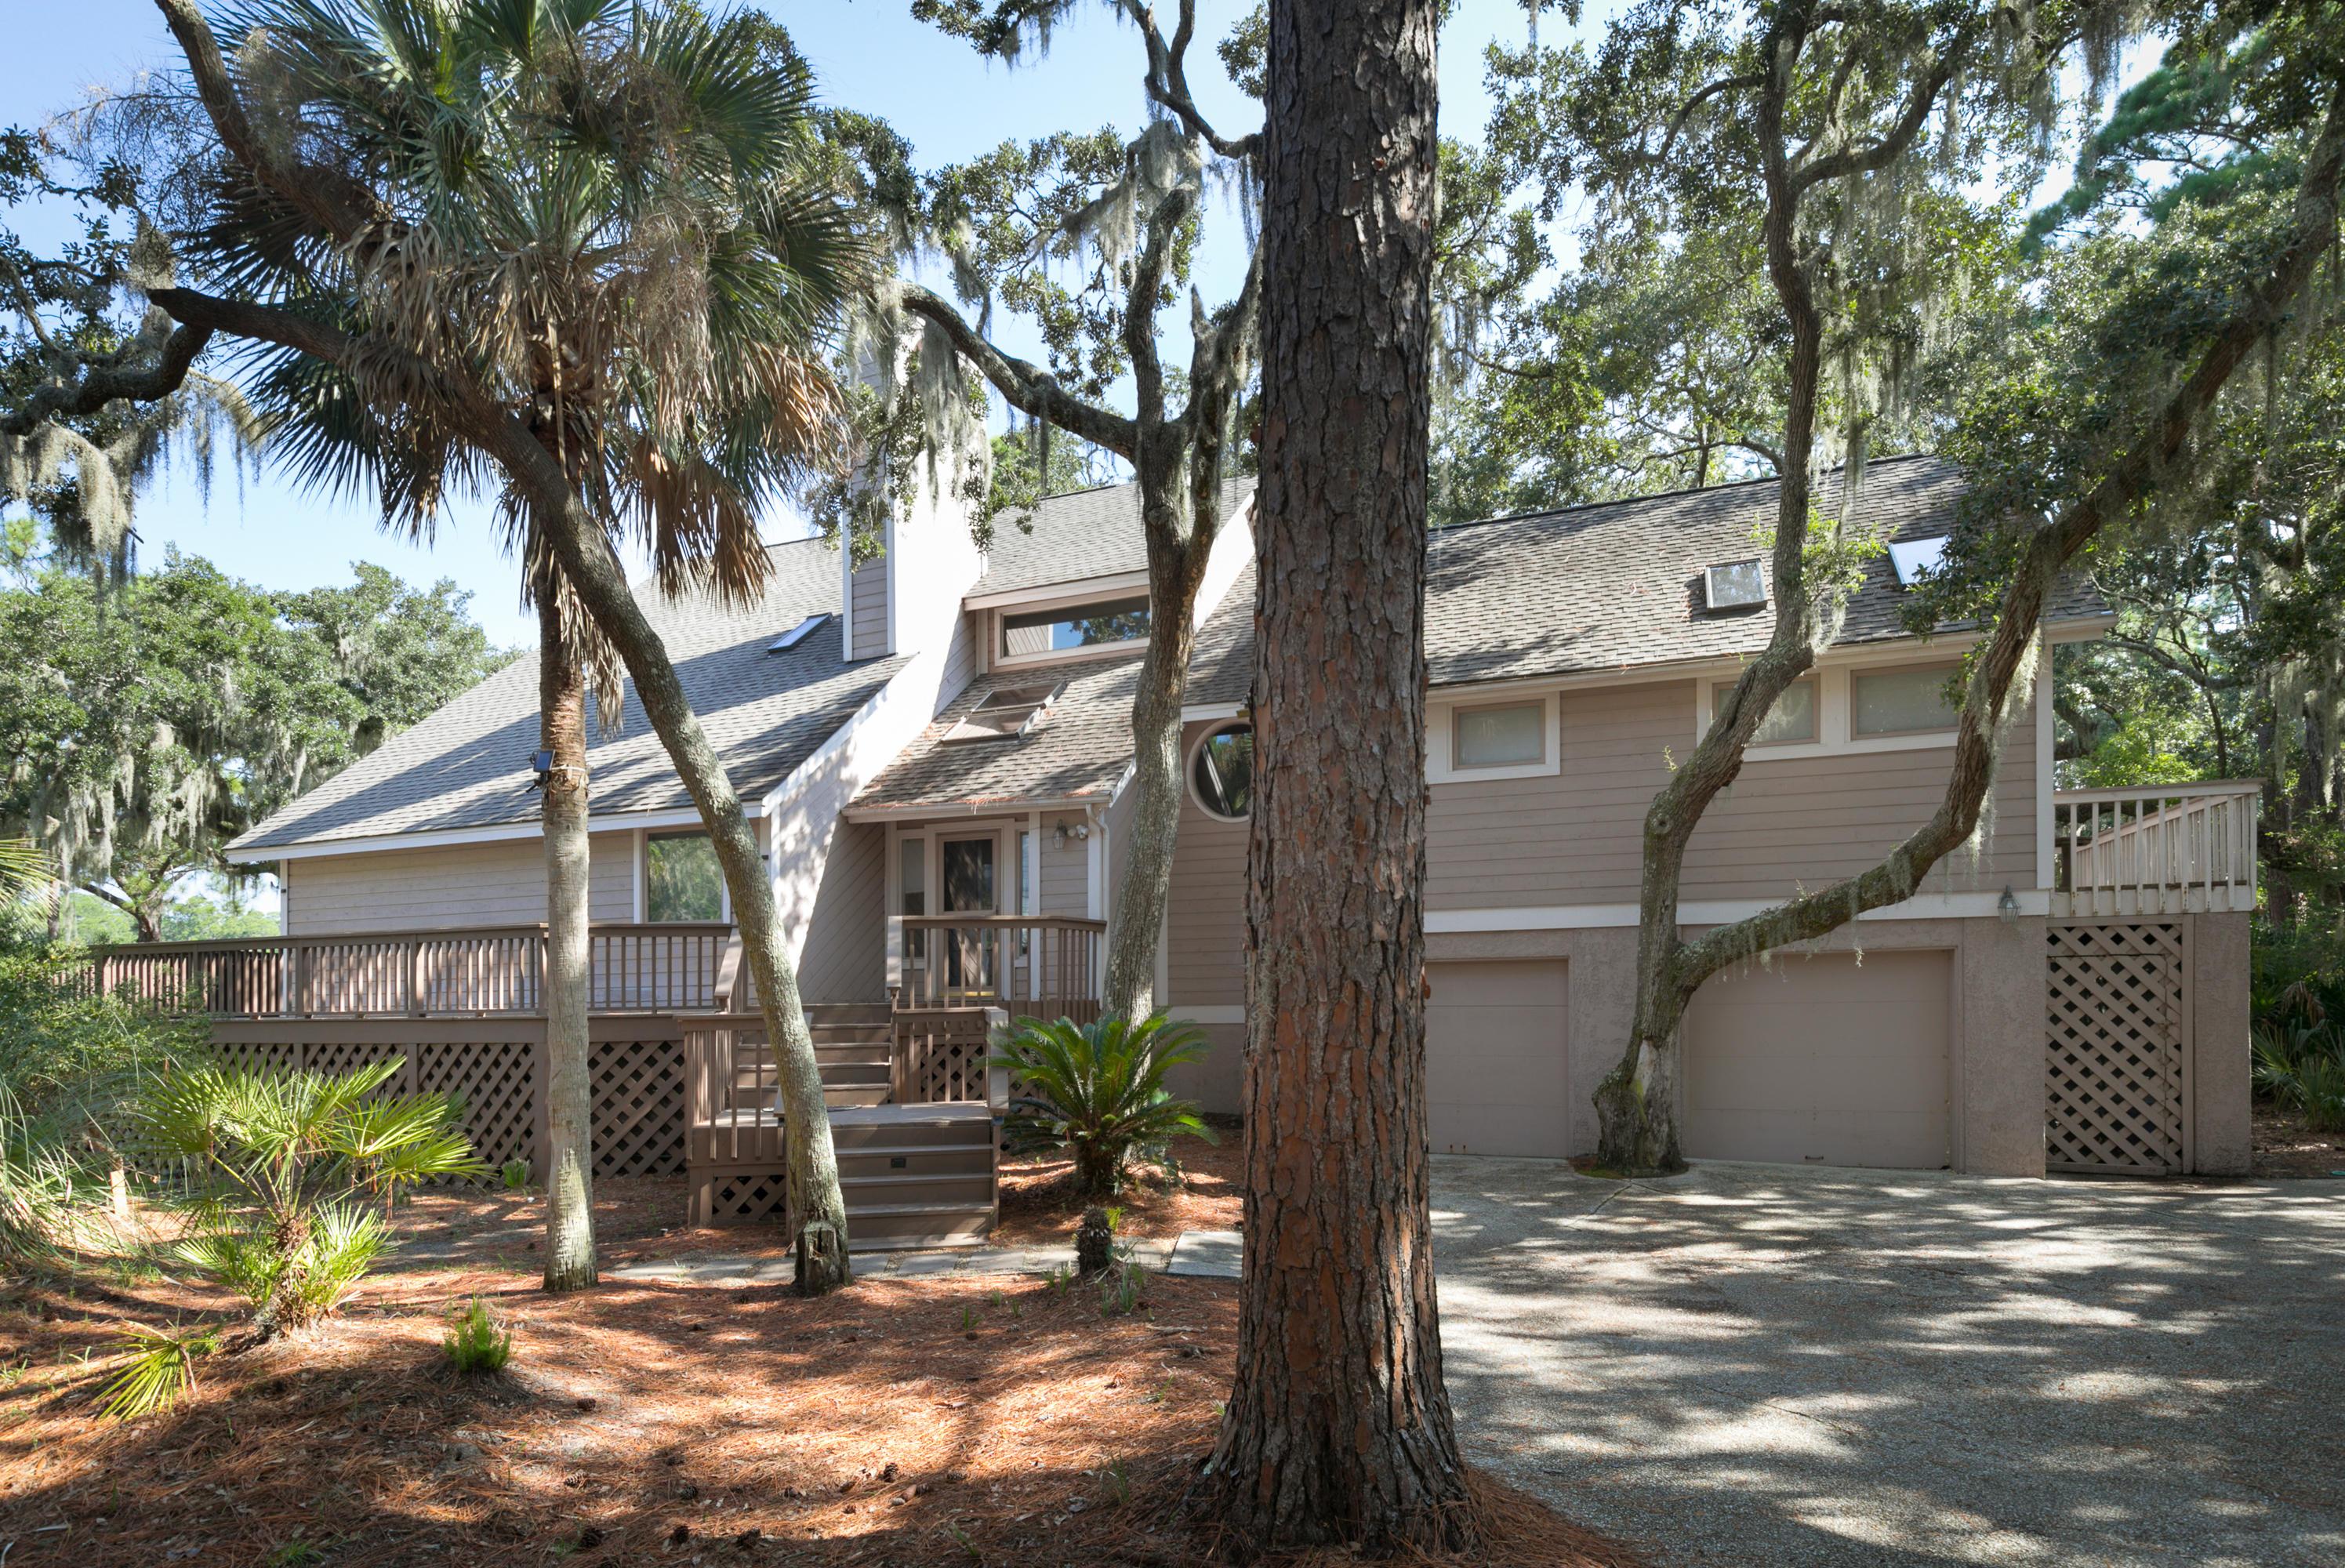 Seabrook Island Homes For Sale - 3080 Marshgate, Seabrook Island, SC - 27